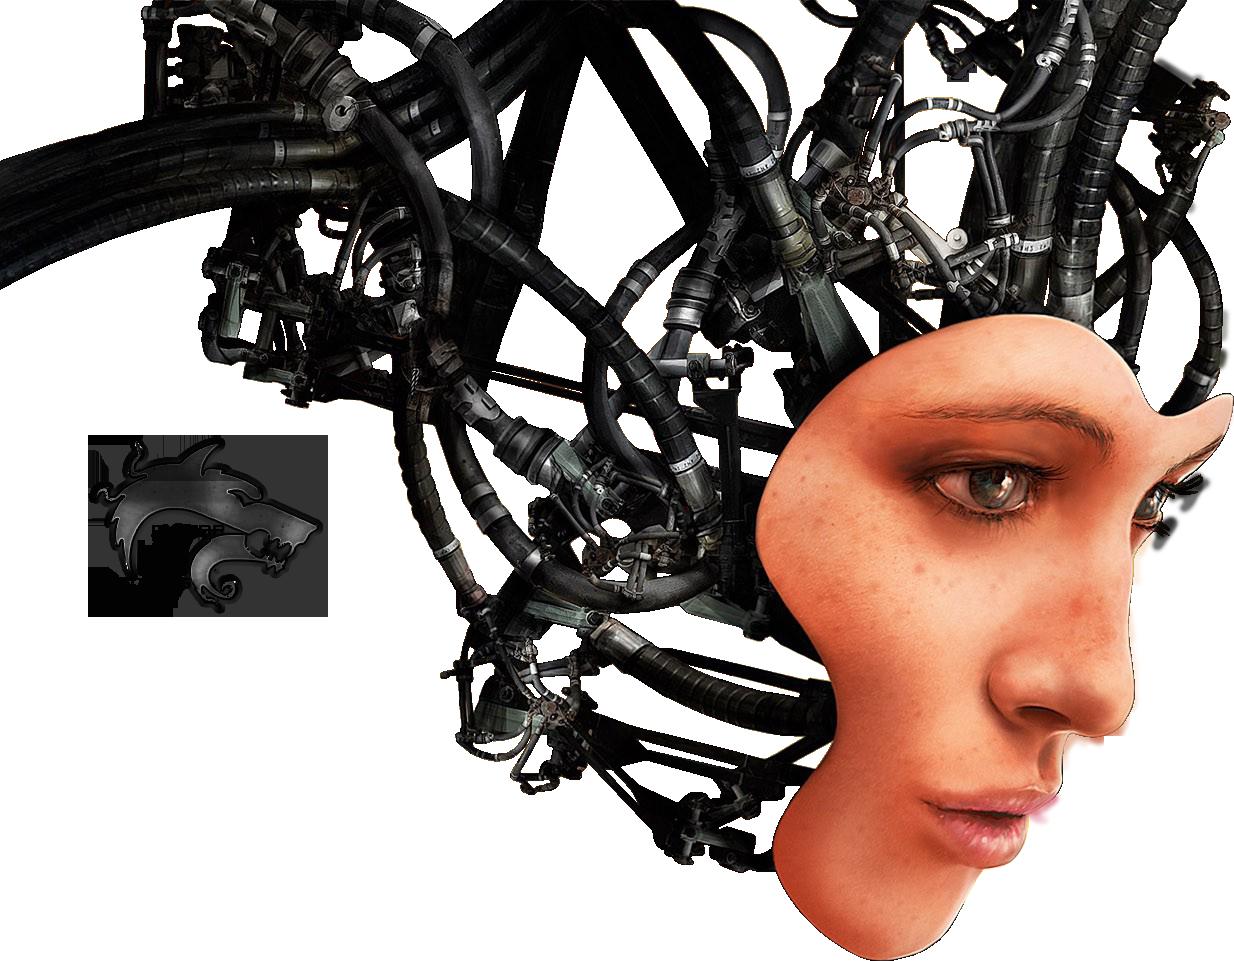 Robot half face clipart picture download Robot Png Half Face - Cyborg Png , Transparent Cartoon - Jing.fm picture download